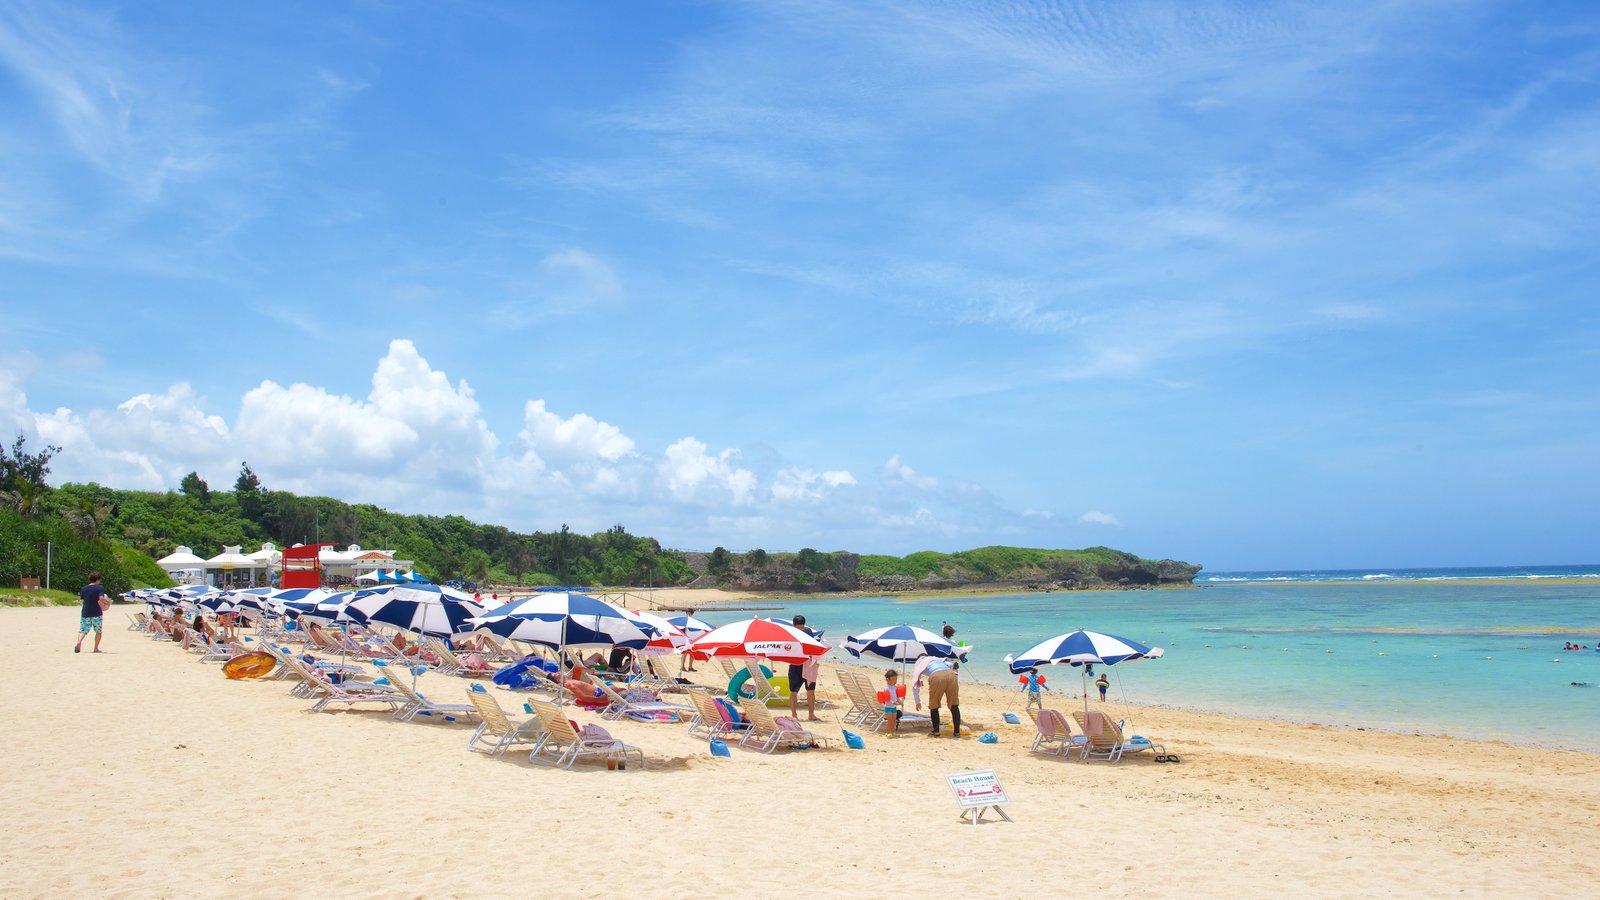 Okinawa gay beach